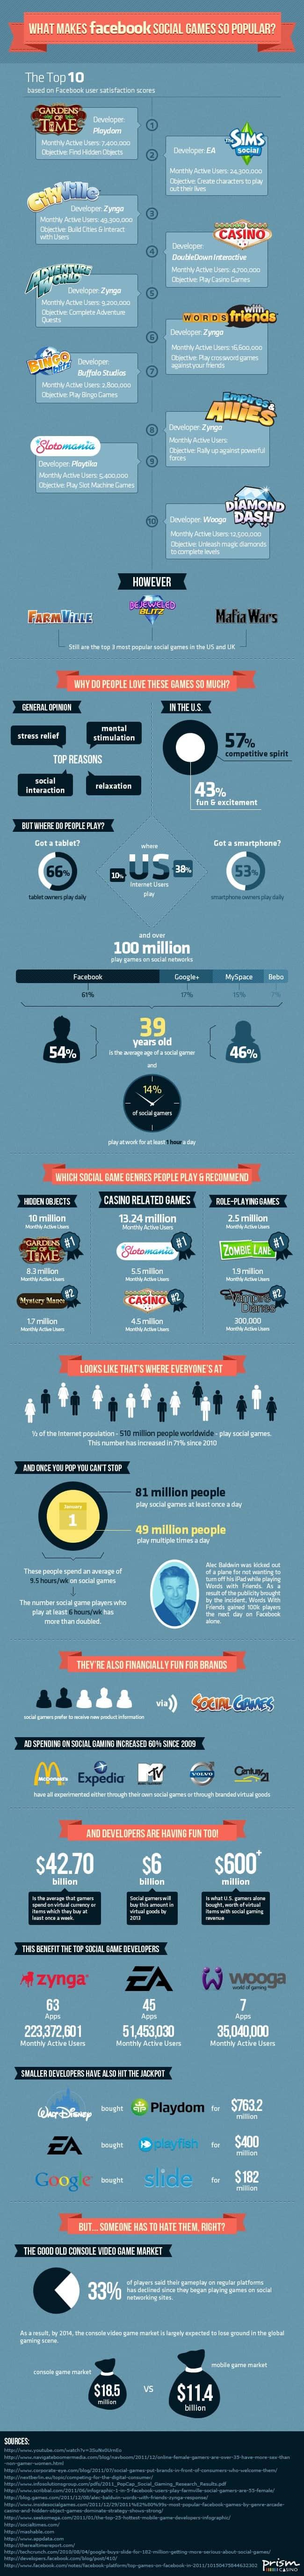 What Makes Social Media Games So Popular?